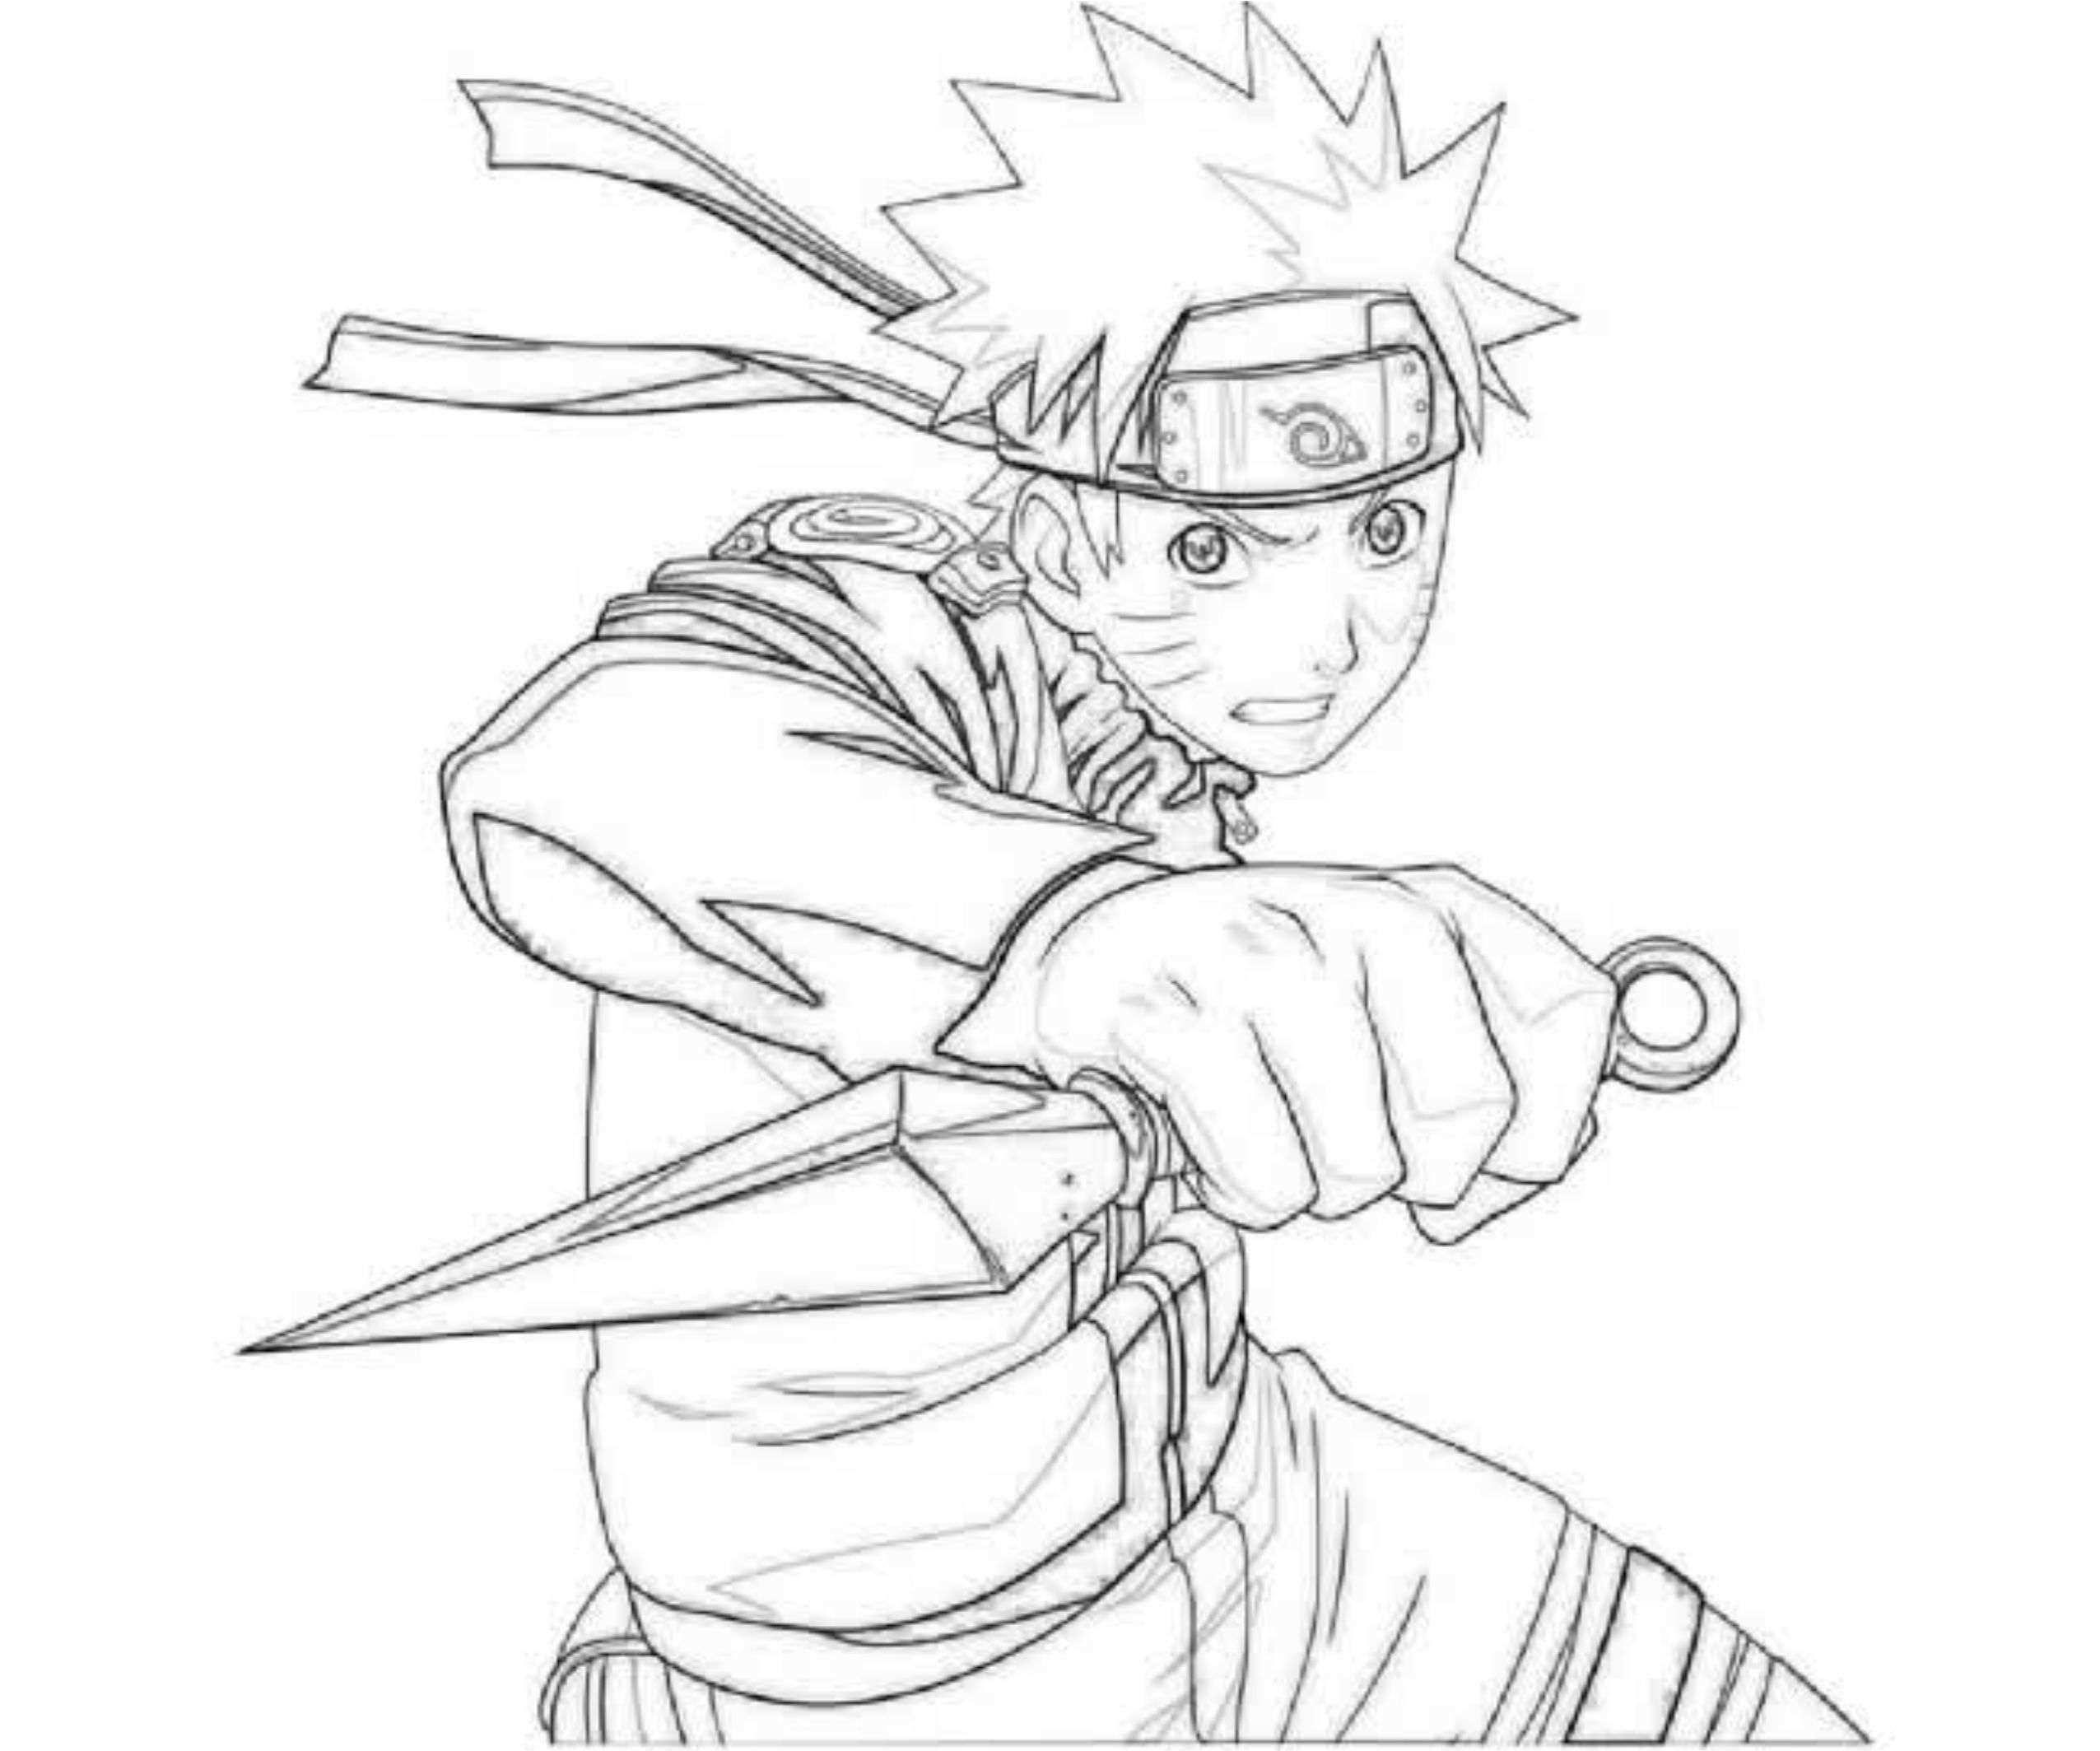 Coloriages À Imprimer : Naruto, Numéro : 5F25268 concernant Coloriage De Naruto Shippuden A Imprimer